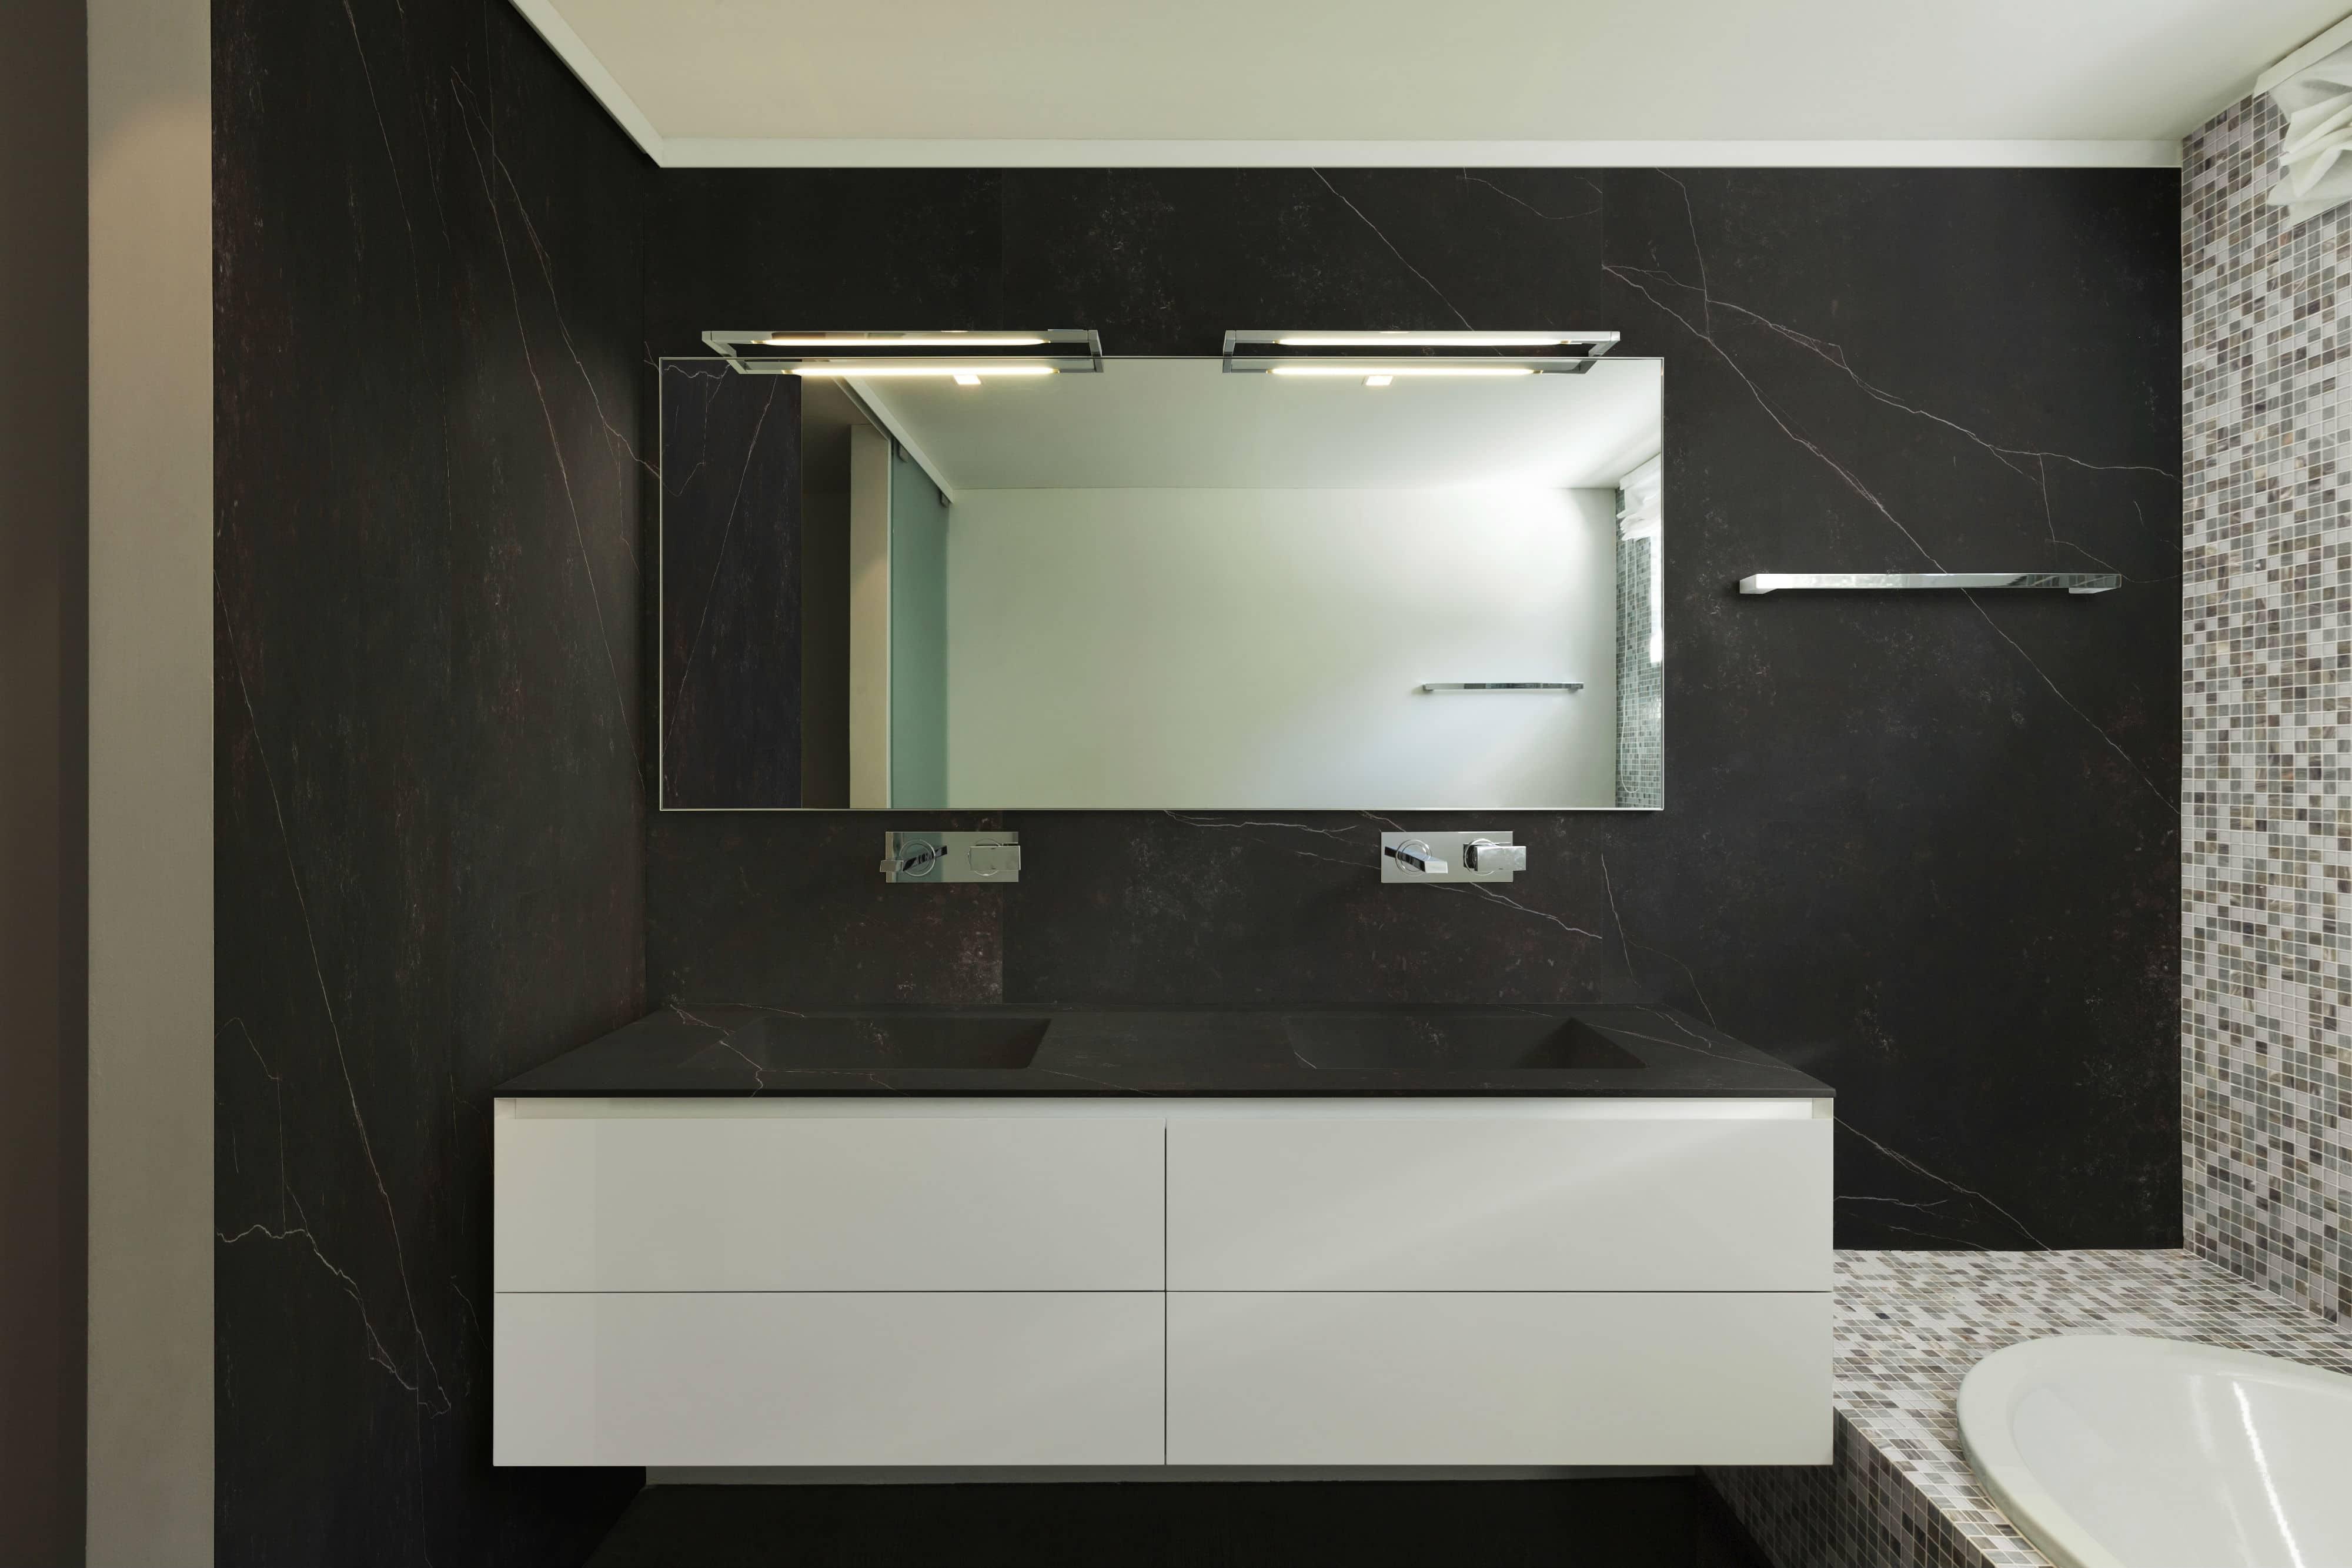 Dekton-Bathroom-Kelya-דקטון-קליה-בראנץ